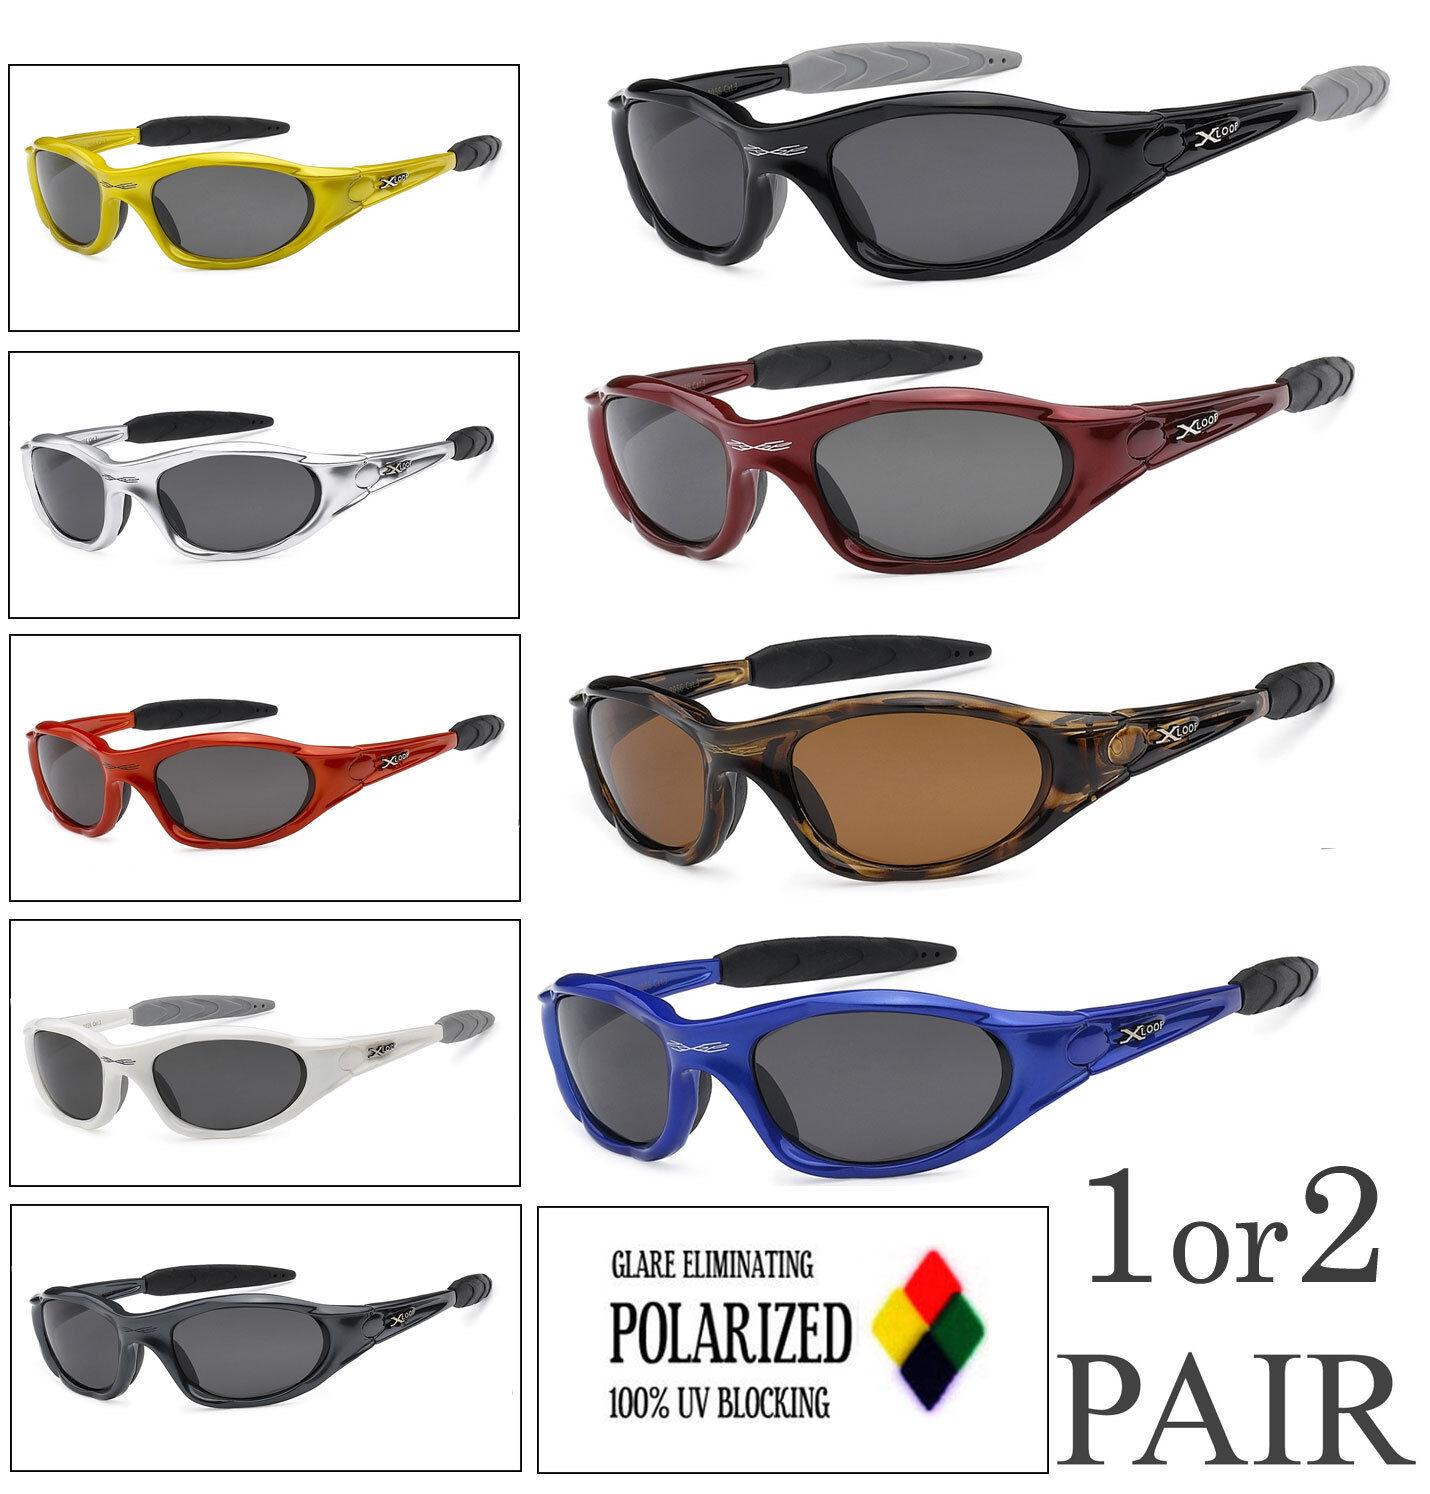 1 O 2 Par X-Loop Lente Polarizada Deporte Ciclismo Pesca Atletismo UV400 Sol